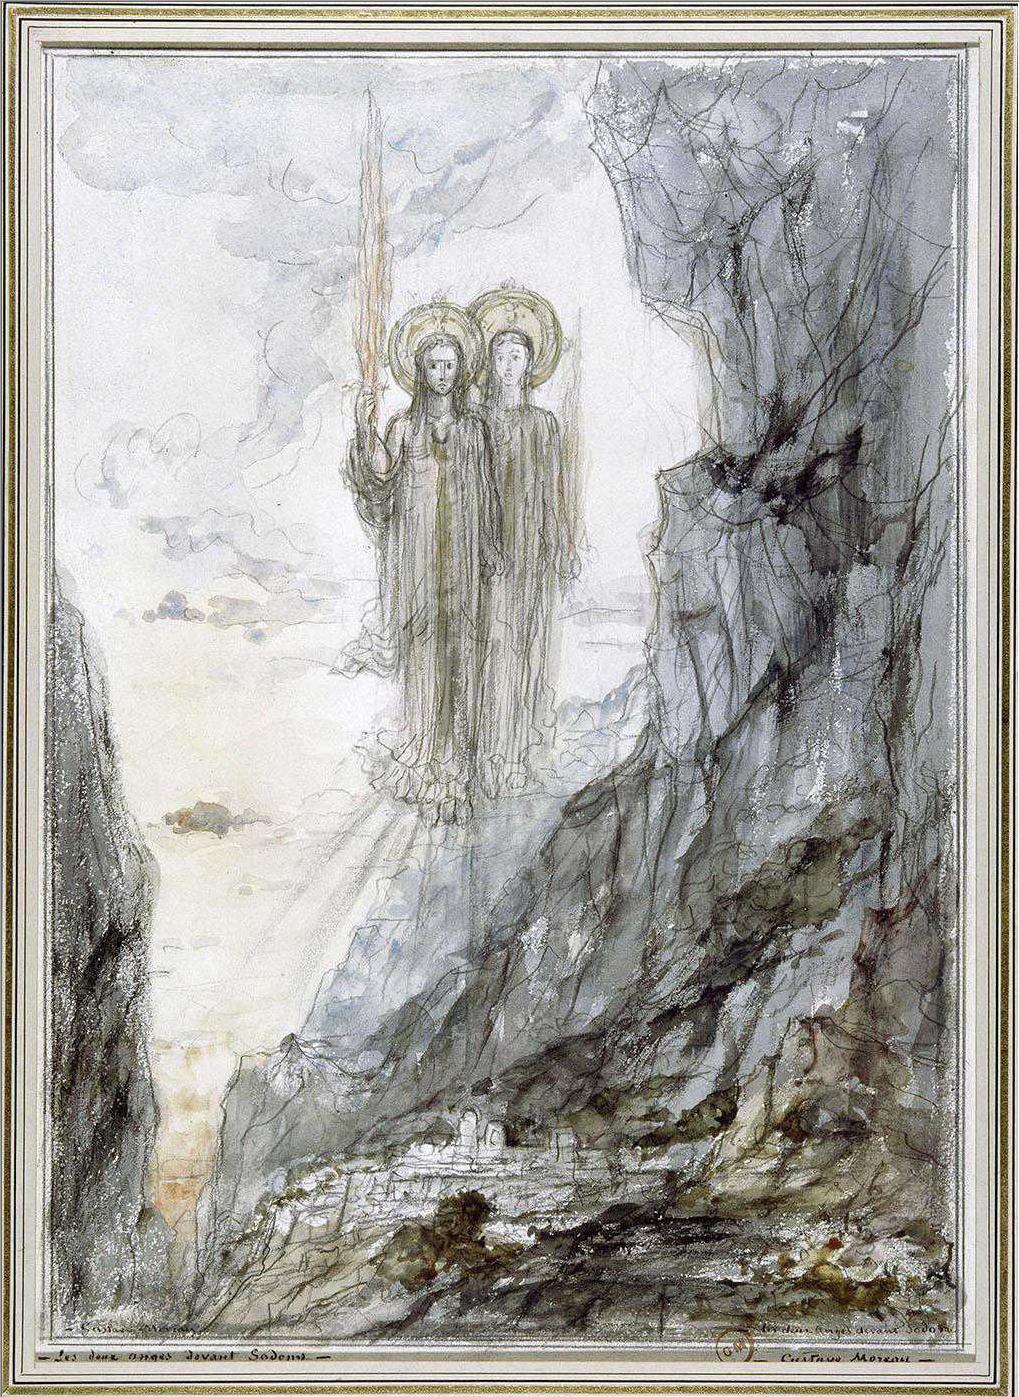 Ангелы Содома (35.9 х 25.5 см) (акварель и карандаш) (Париж, музей Гюстава Моро)